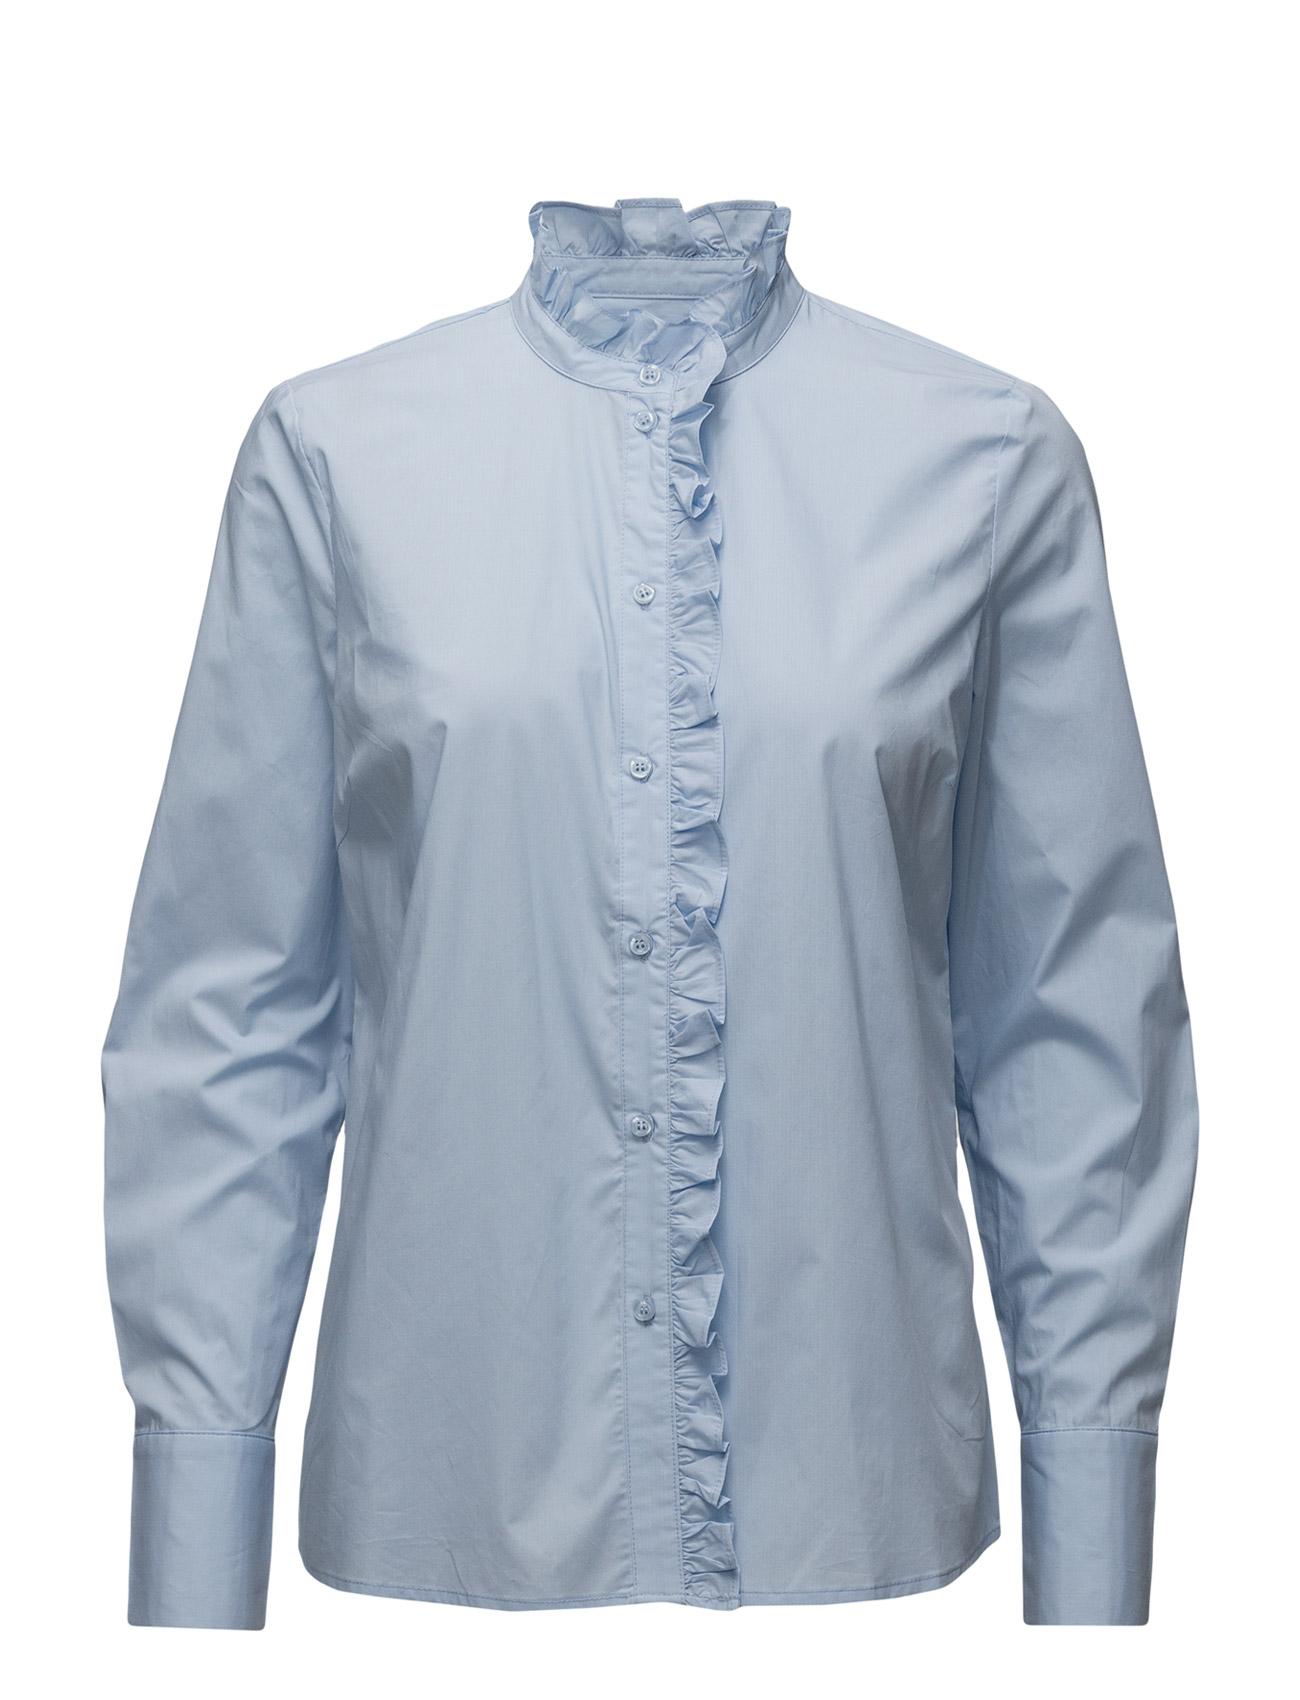 Gestuz Inesa shirt MS17